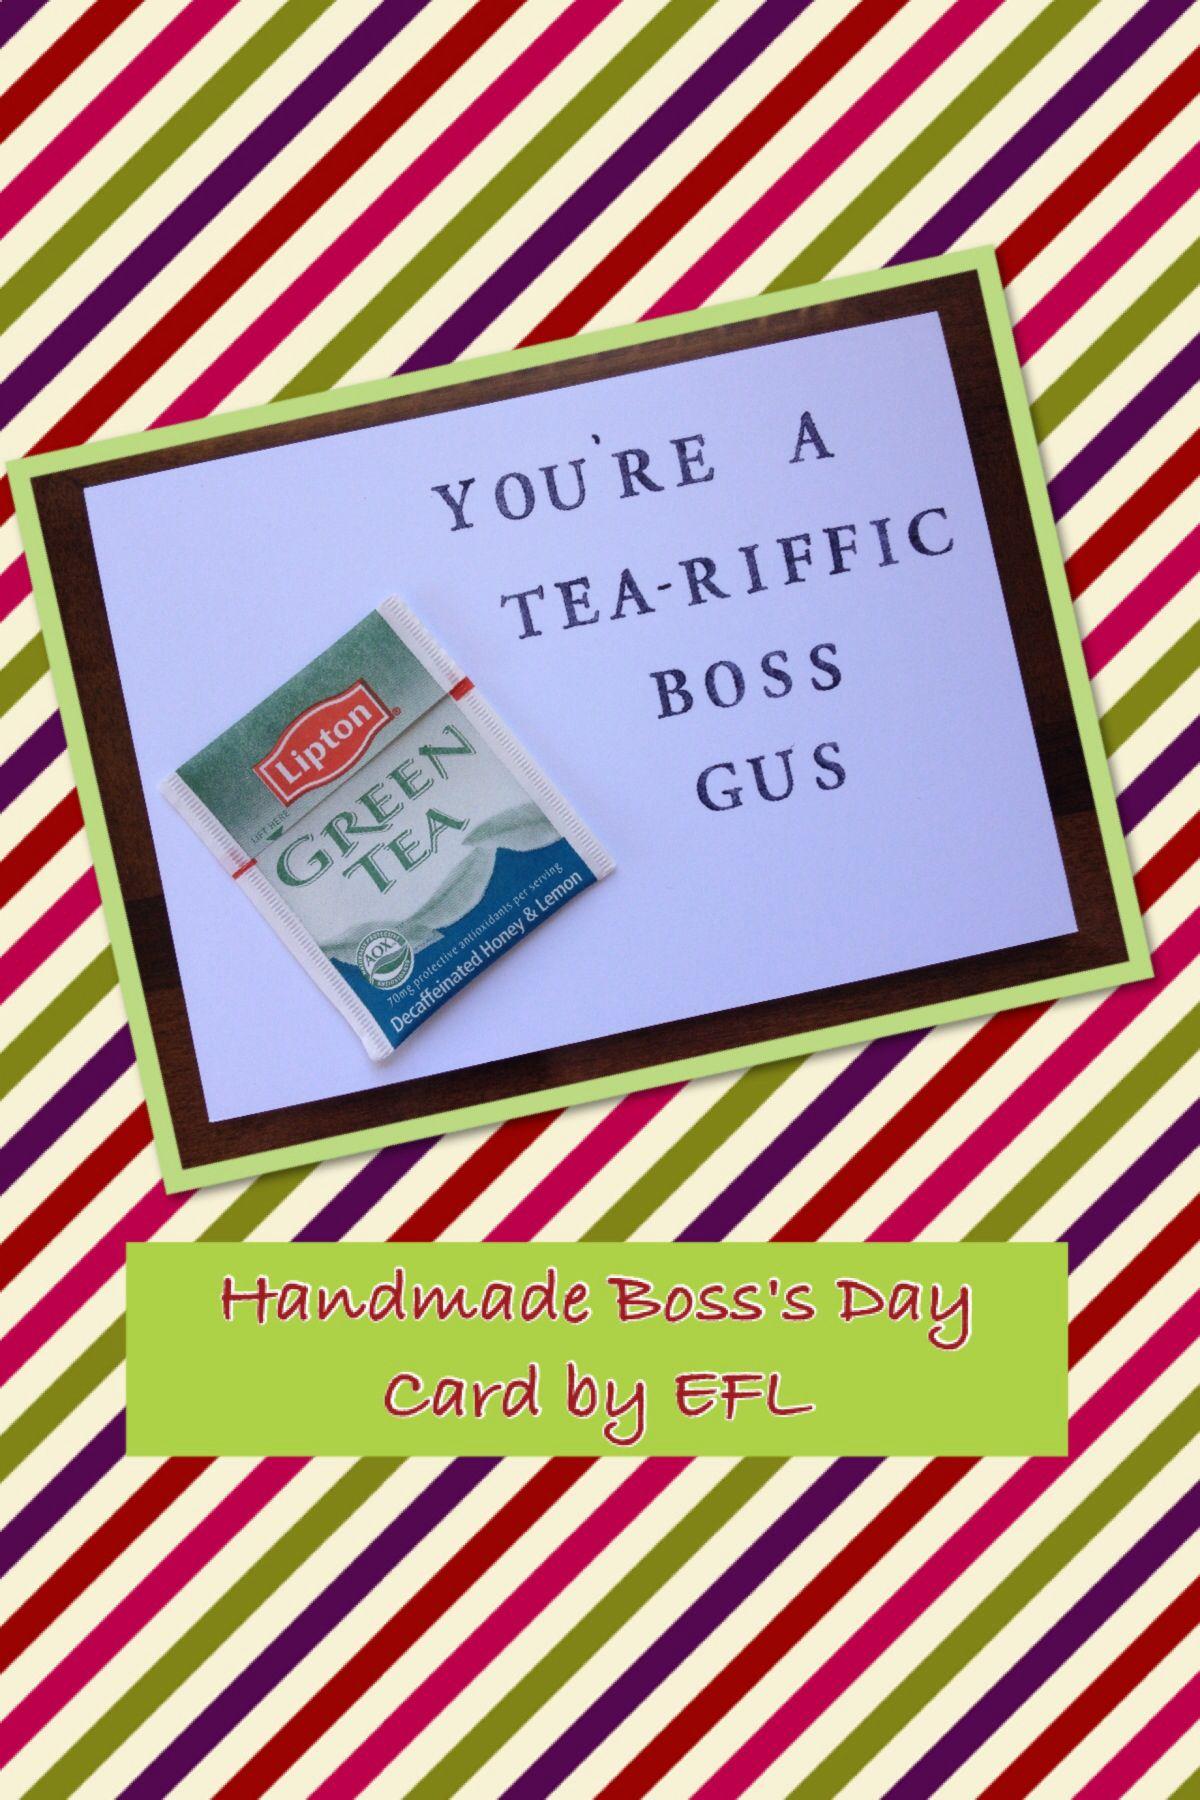 My Handmade Boss's Day Cardefl.   My Homemade Cardsefl - Boss Day Cards Free Printable